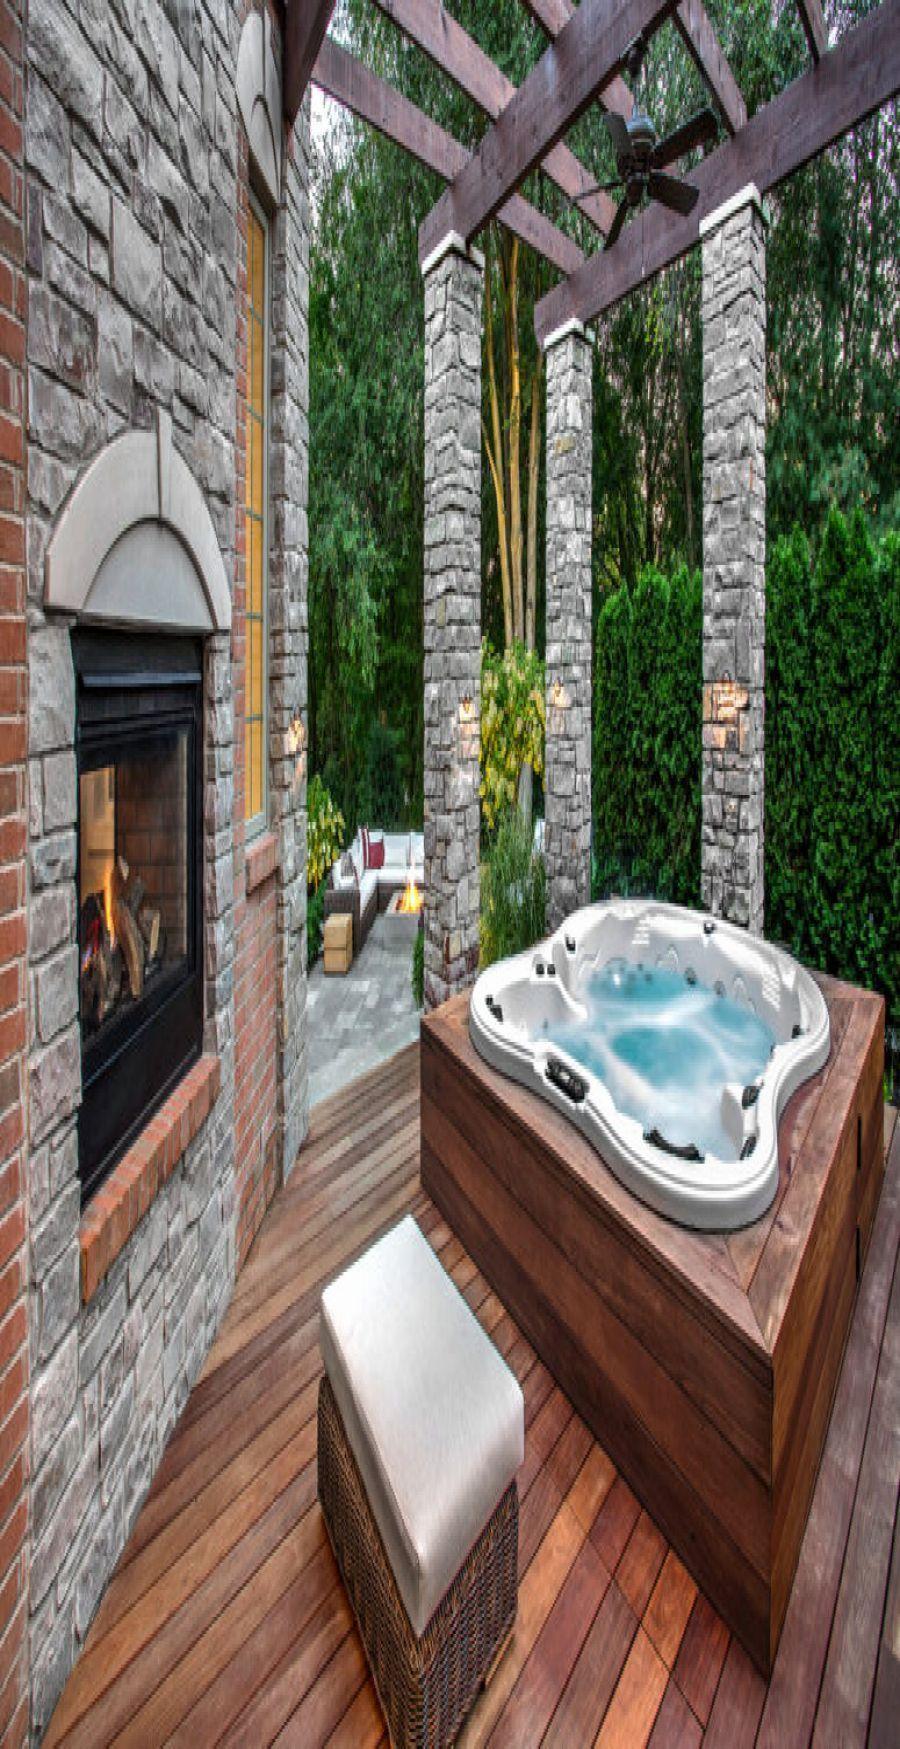 Inspirational Garden Design Ideas With Hot Tub Hottubdeck Inspirational Garden Design Garden Hot Hottubdeck Hot Tub Patio Hot Tub Deck Hot Tub Designs